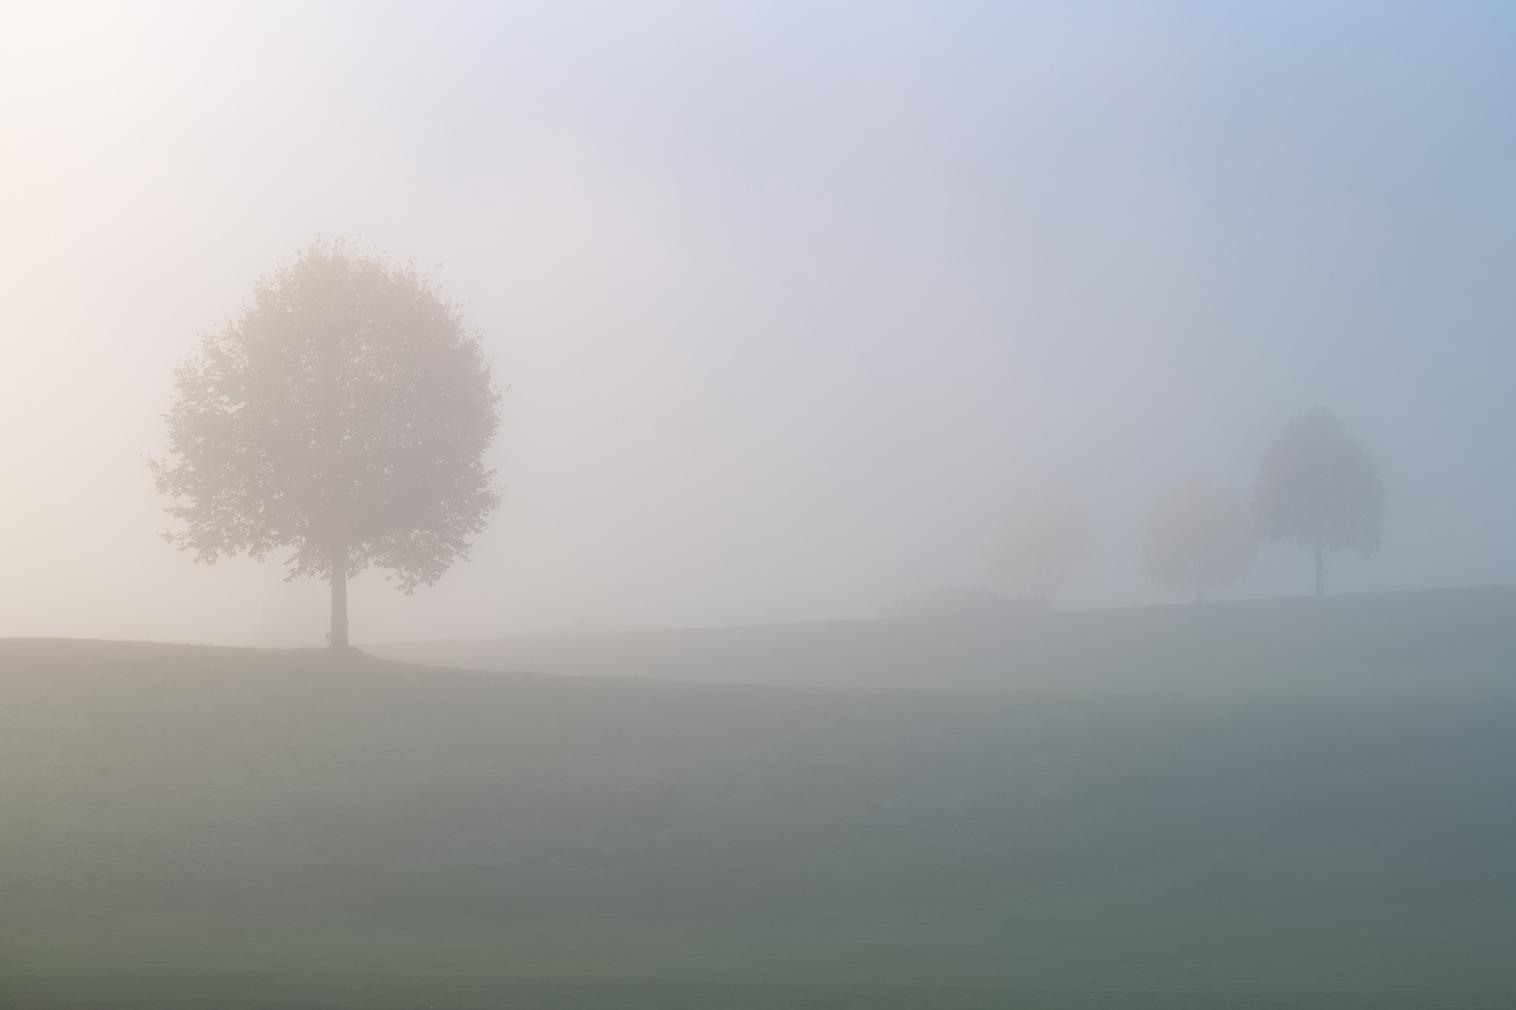 trees on a foggy field